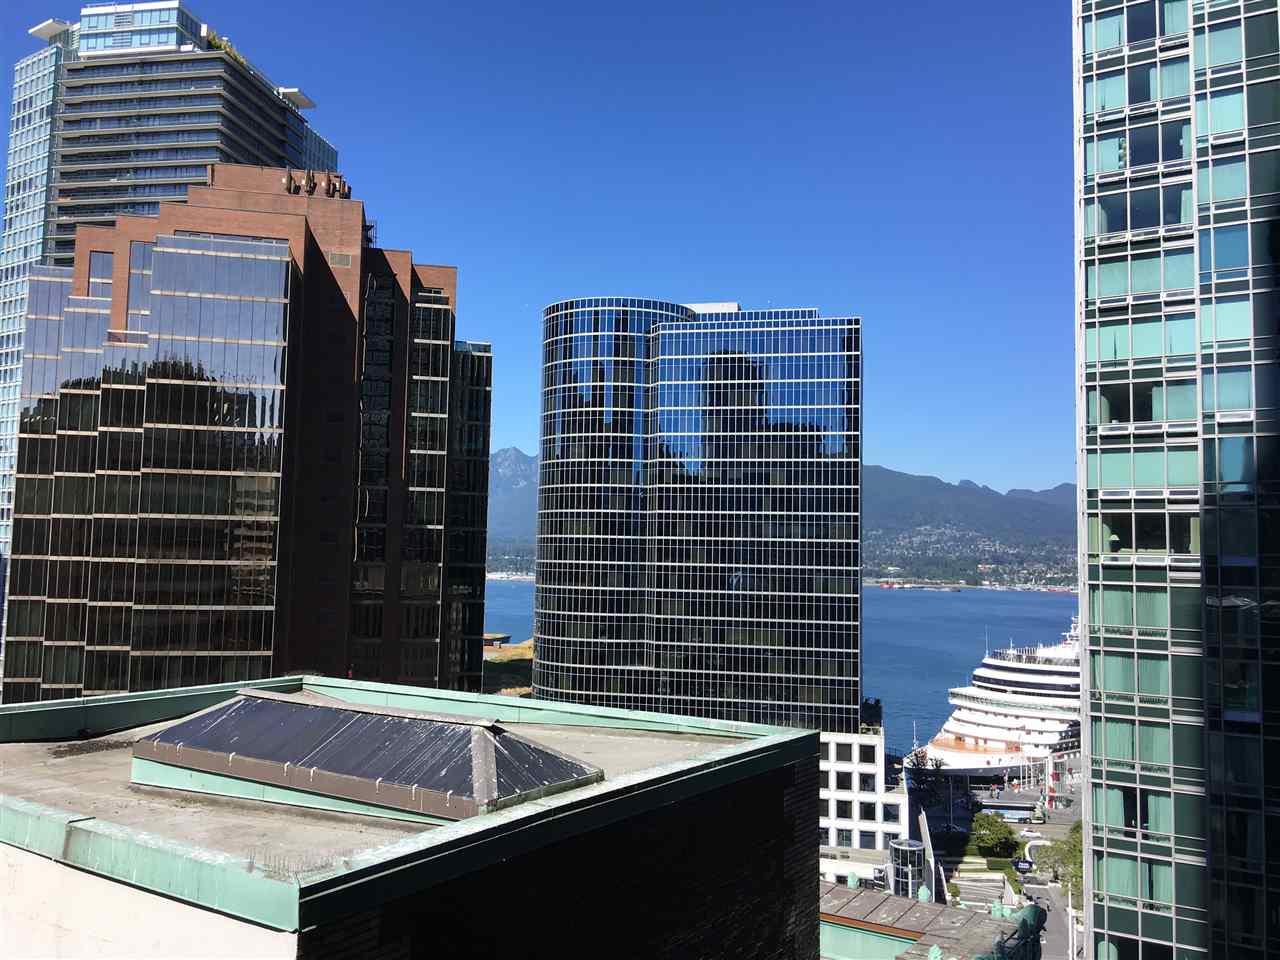 Condo Apartment at 1407 838 W HASTINGS STREET, Unit 1407, Vancouver West, British Columbia. Image 1